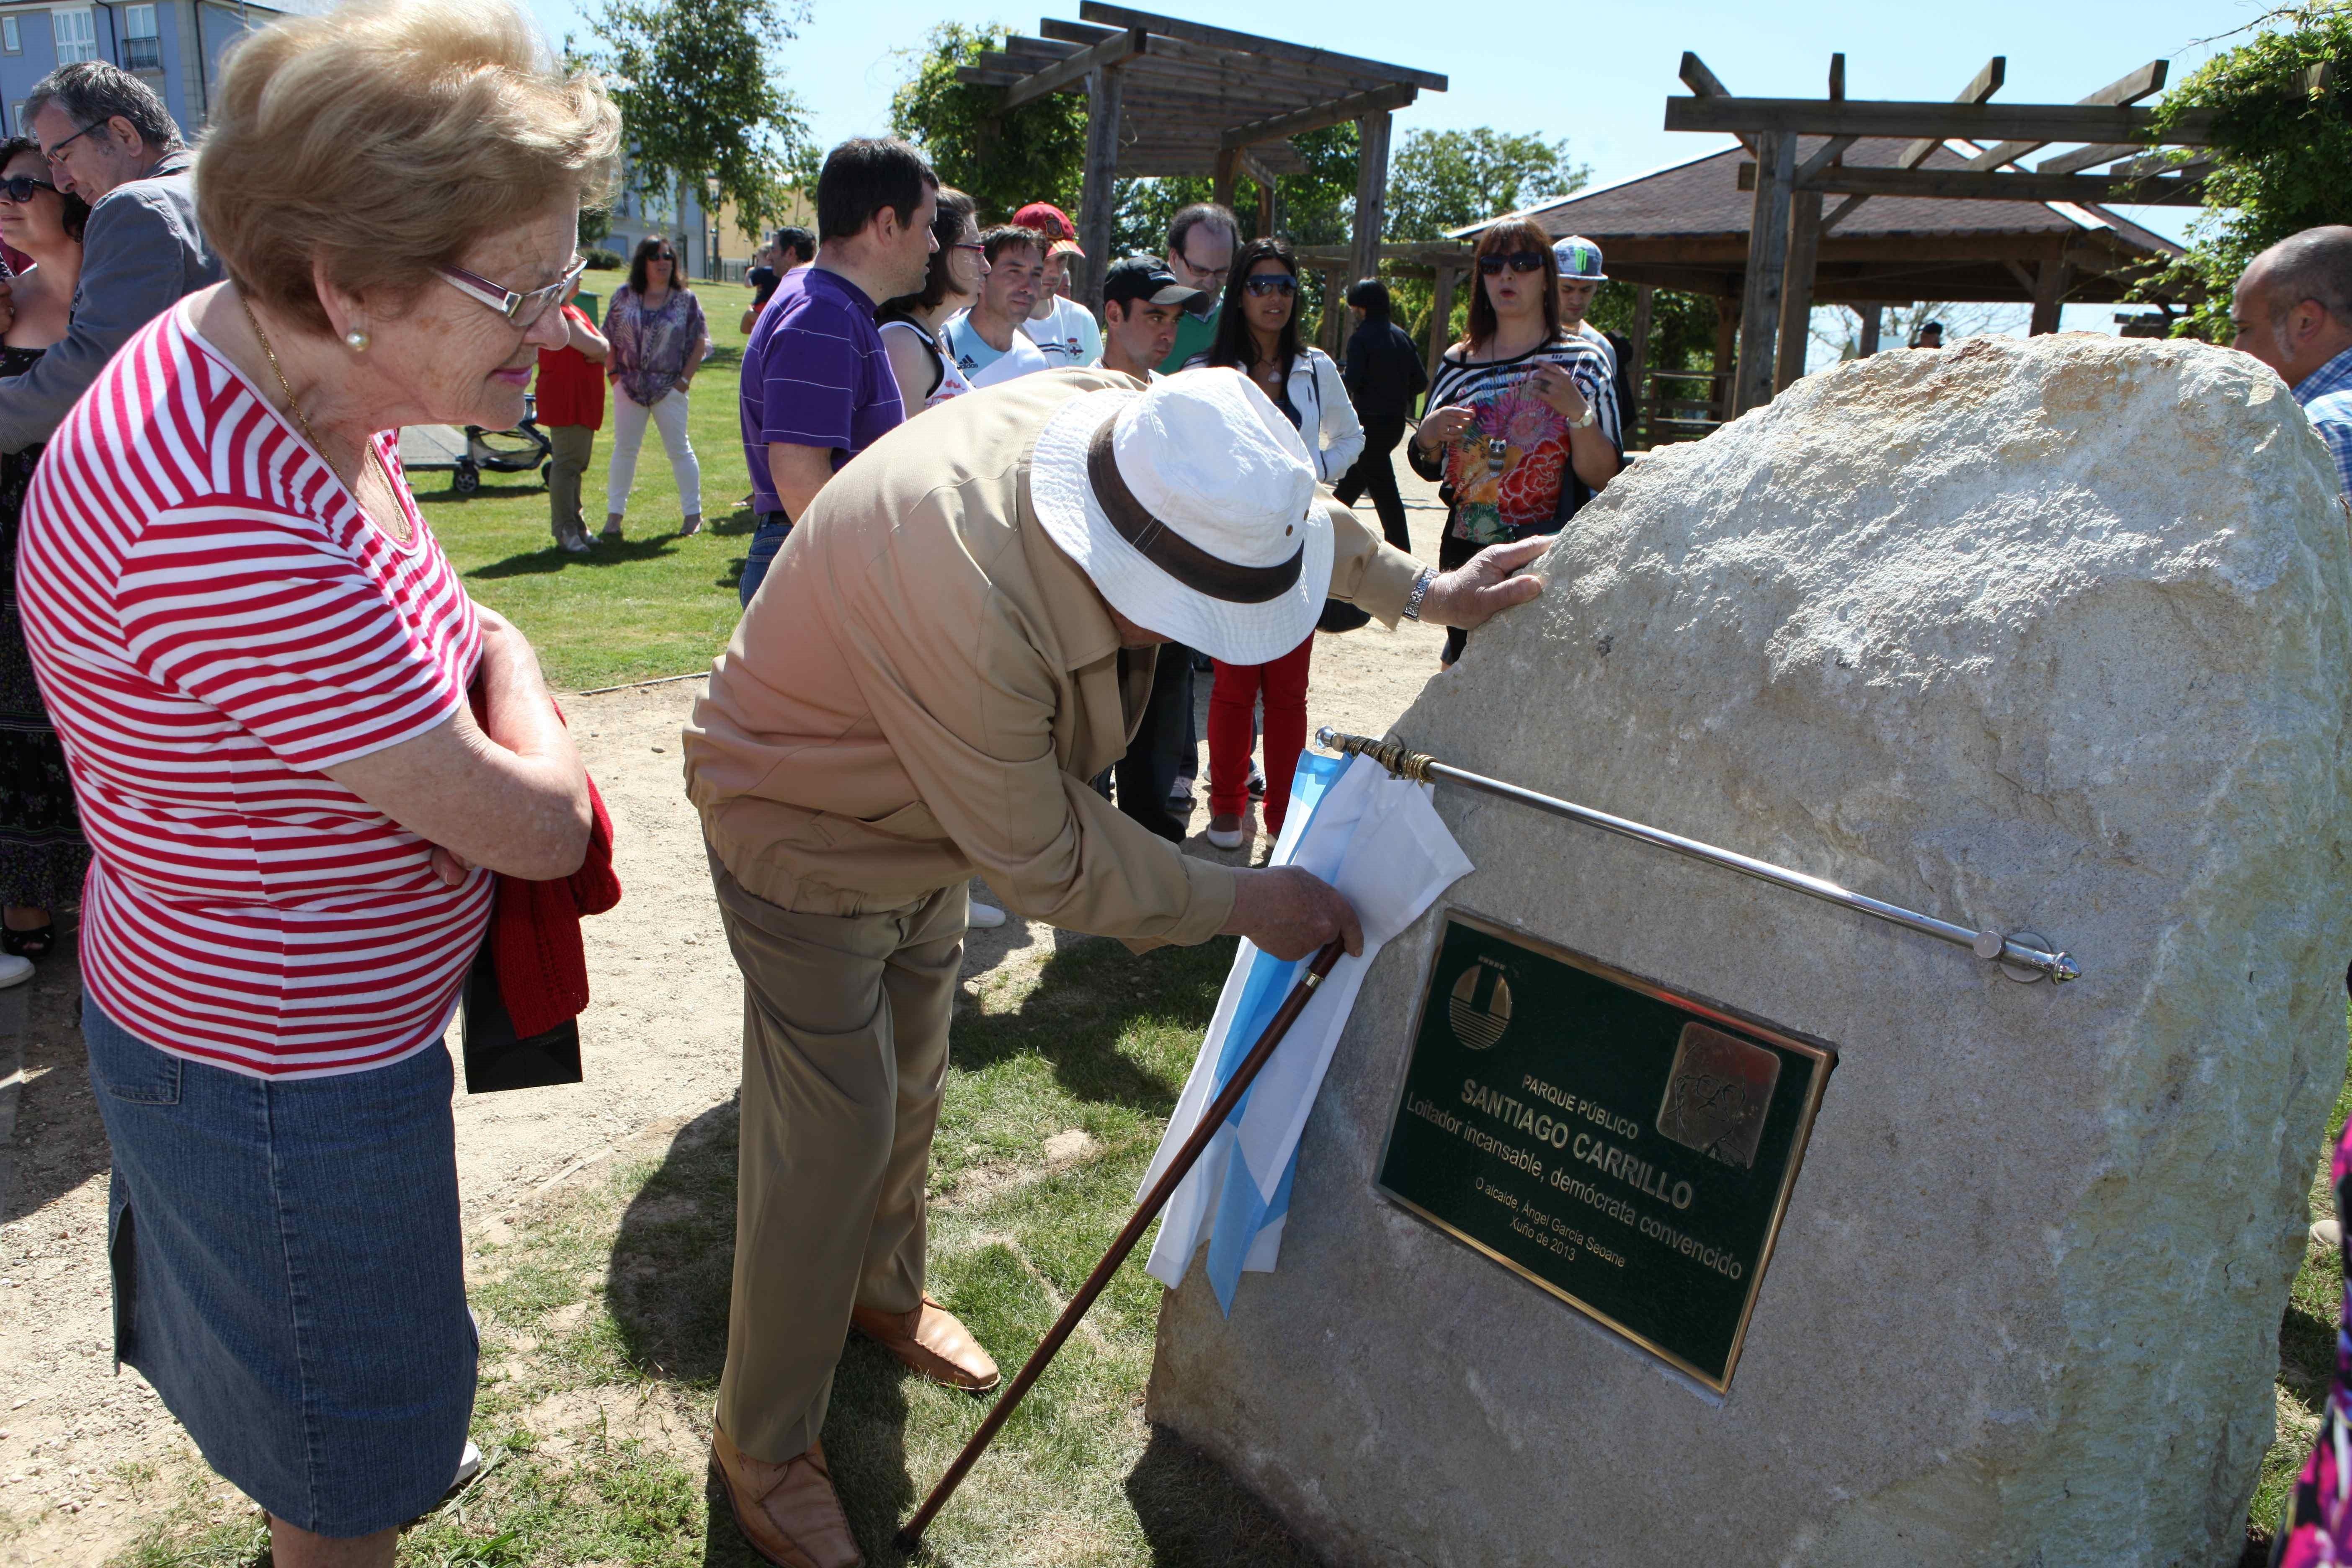 Oleiros (A Coruña) inaugura el parque dedicado a Santiago Carrillo